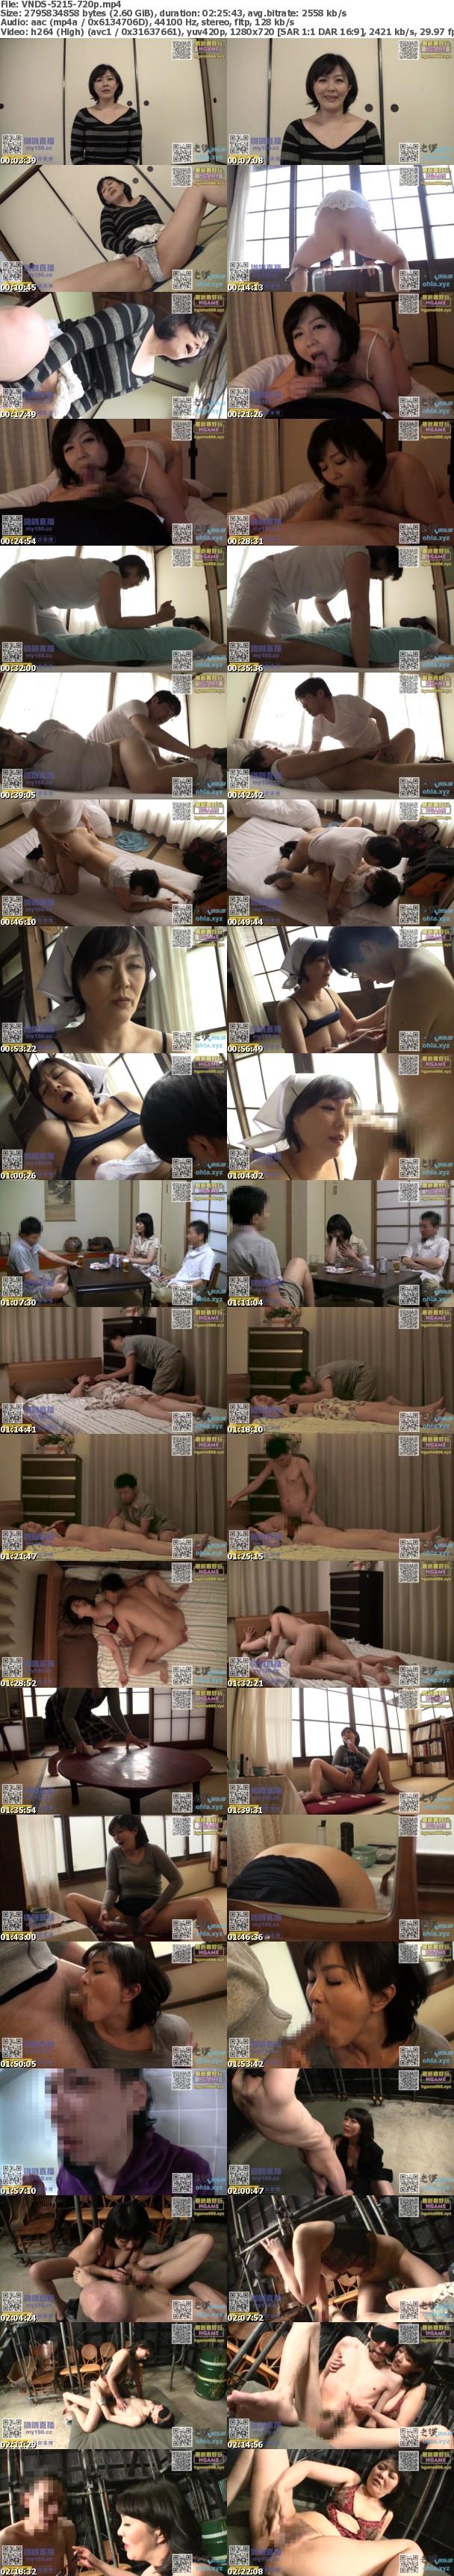 (HD) VNDS-5215 極上熟女 円城ひとみ 魔性の愛慾